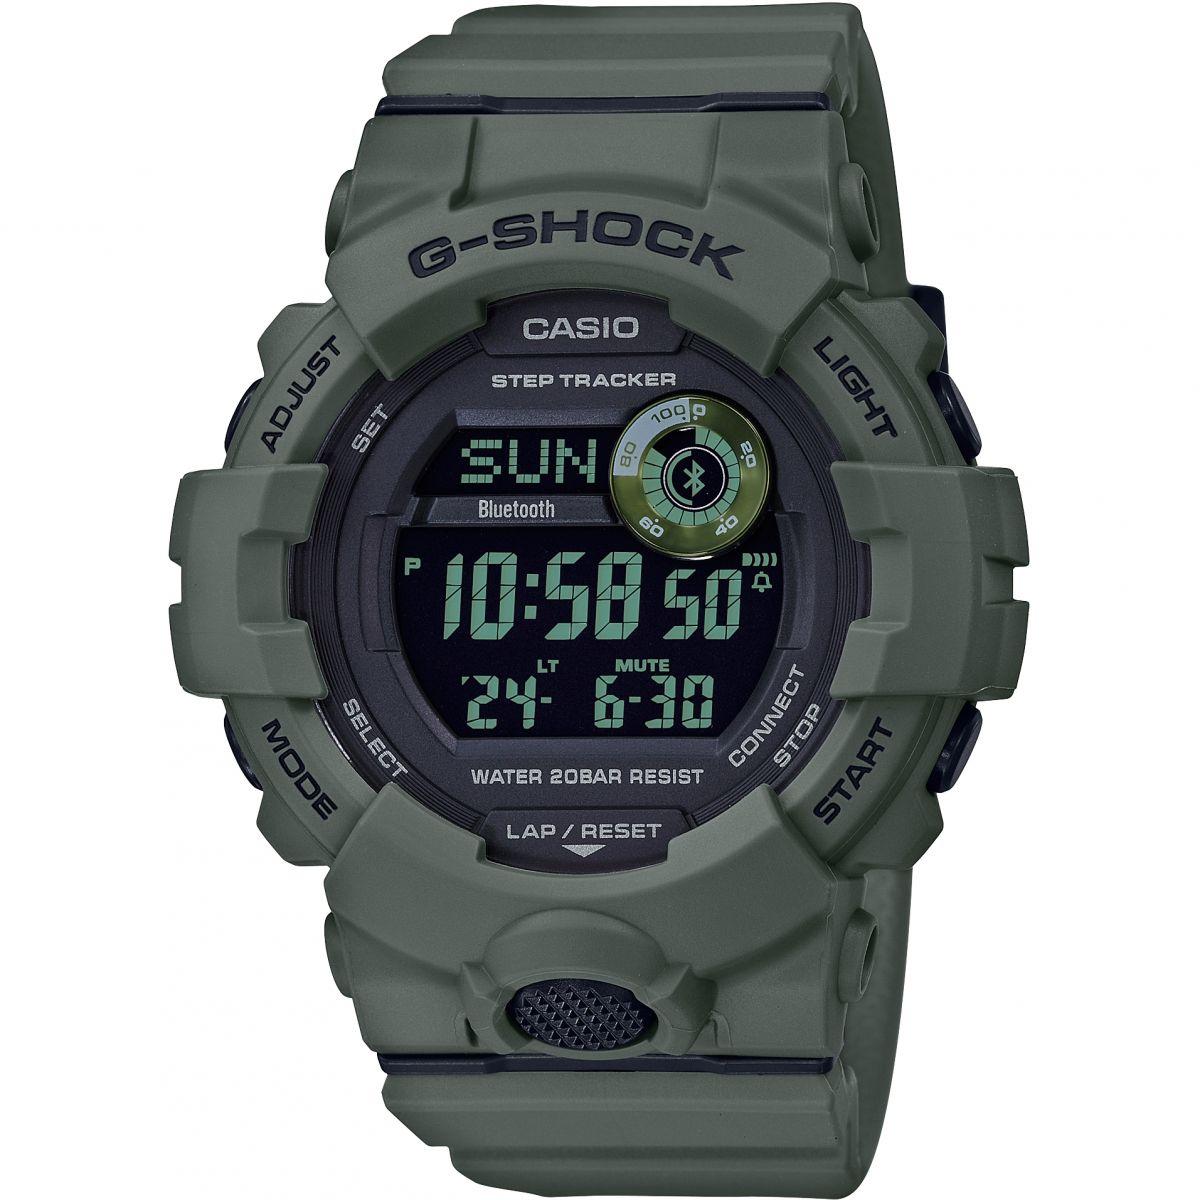 Zegrek Casio G-Shock Bluetooth GBD-800UC-3ER z 99,90£ na 84£ możliwe 75,60£